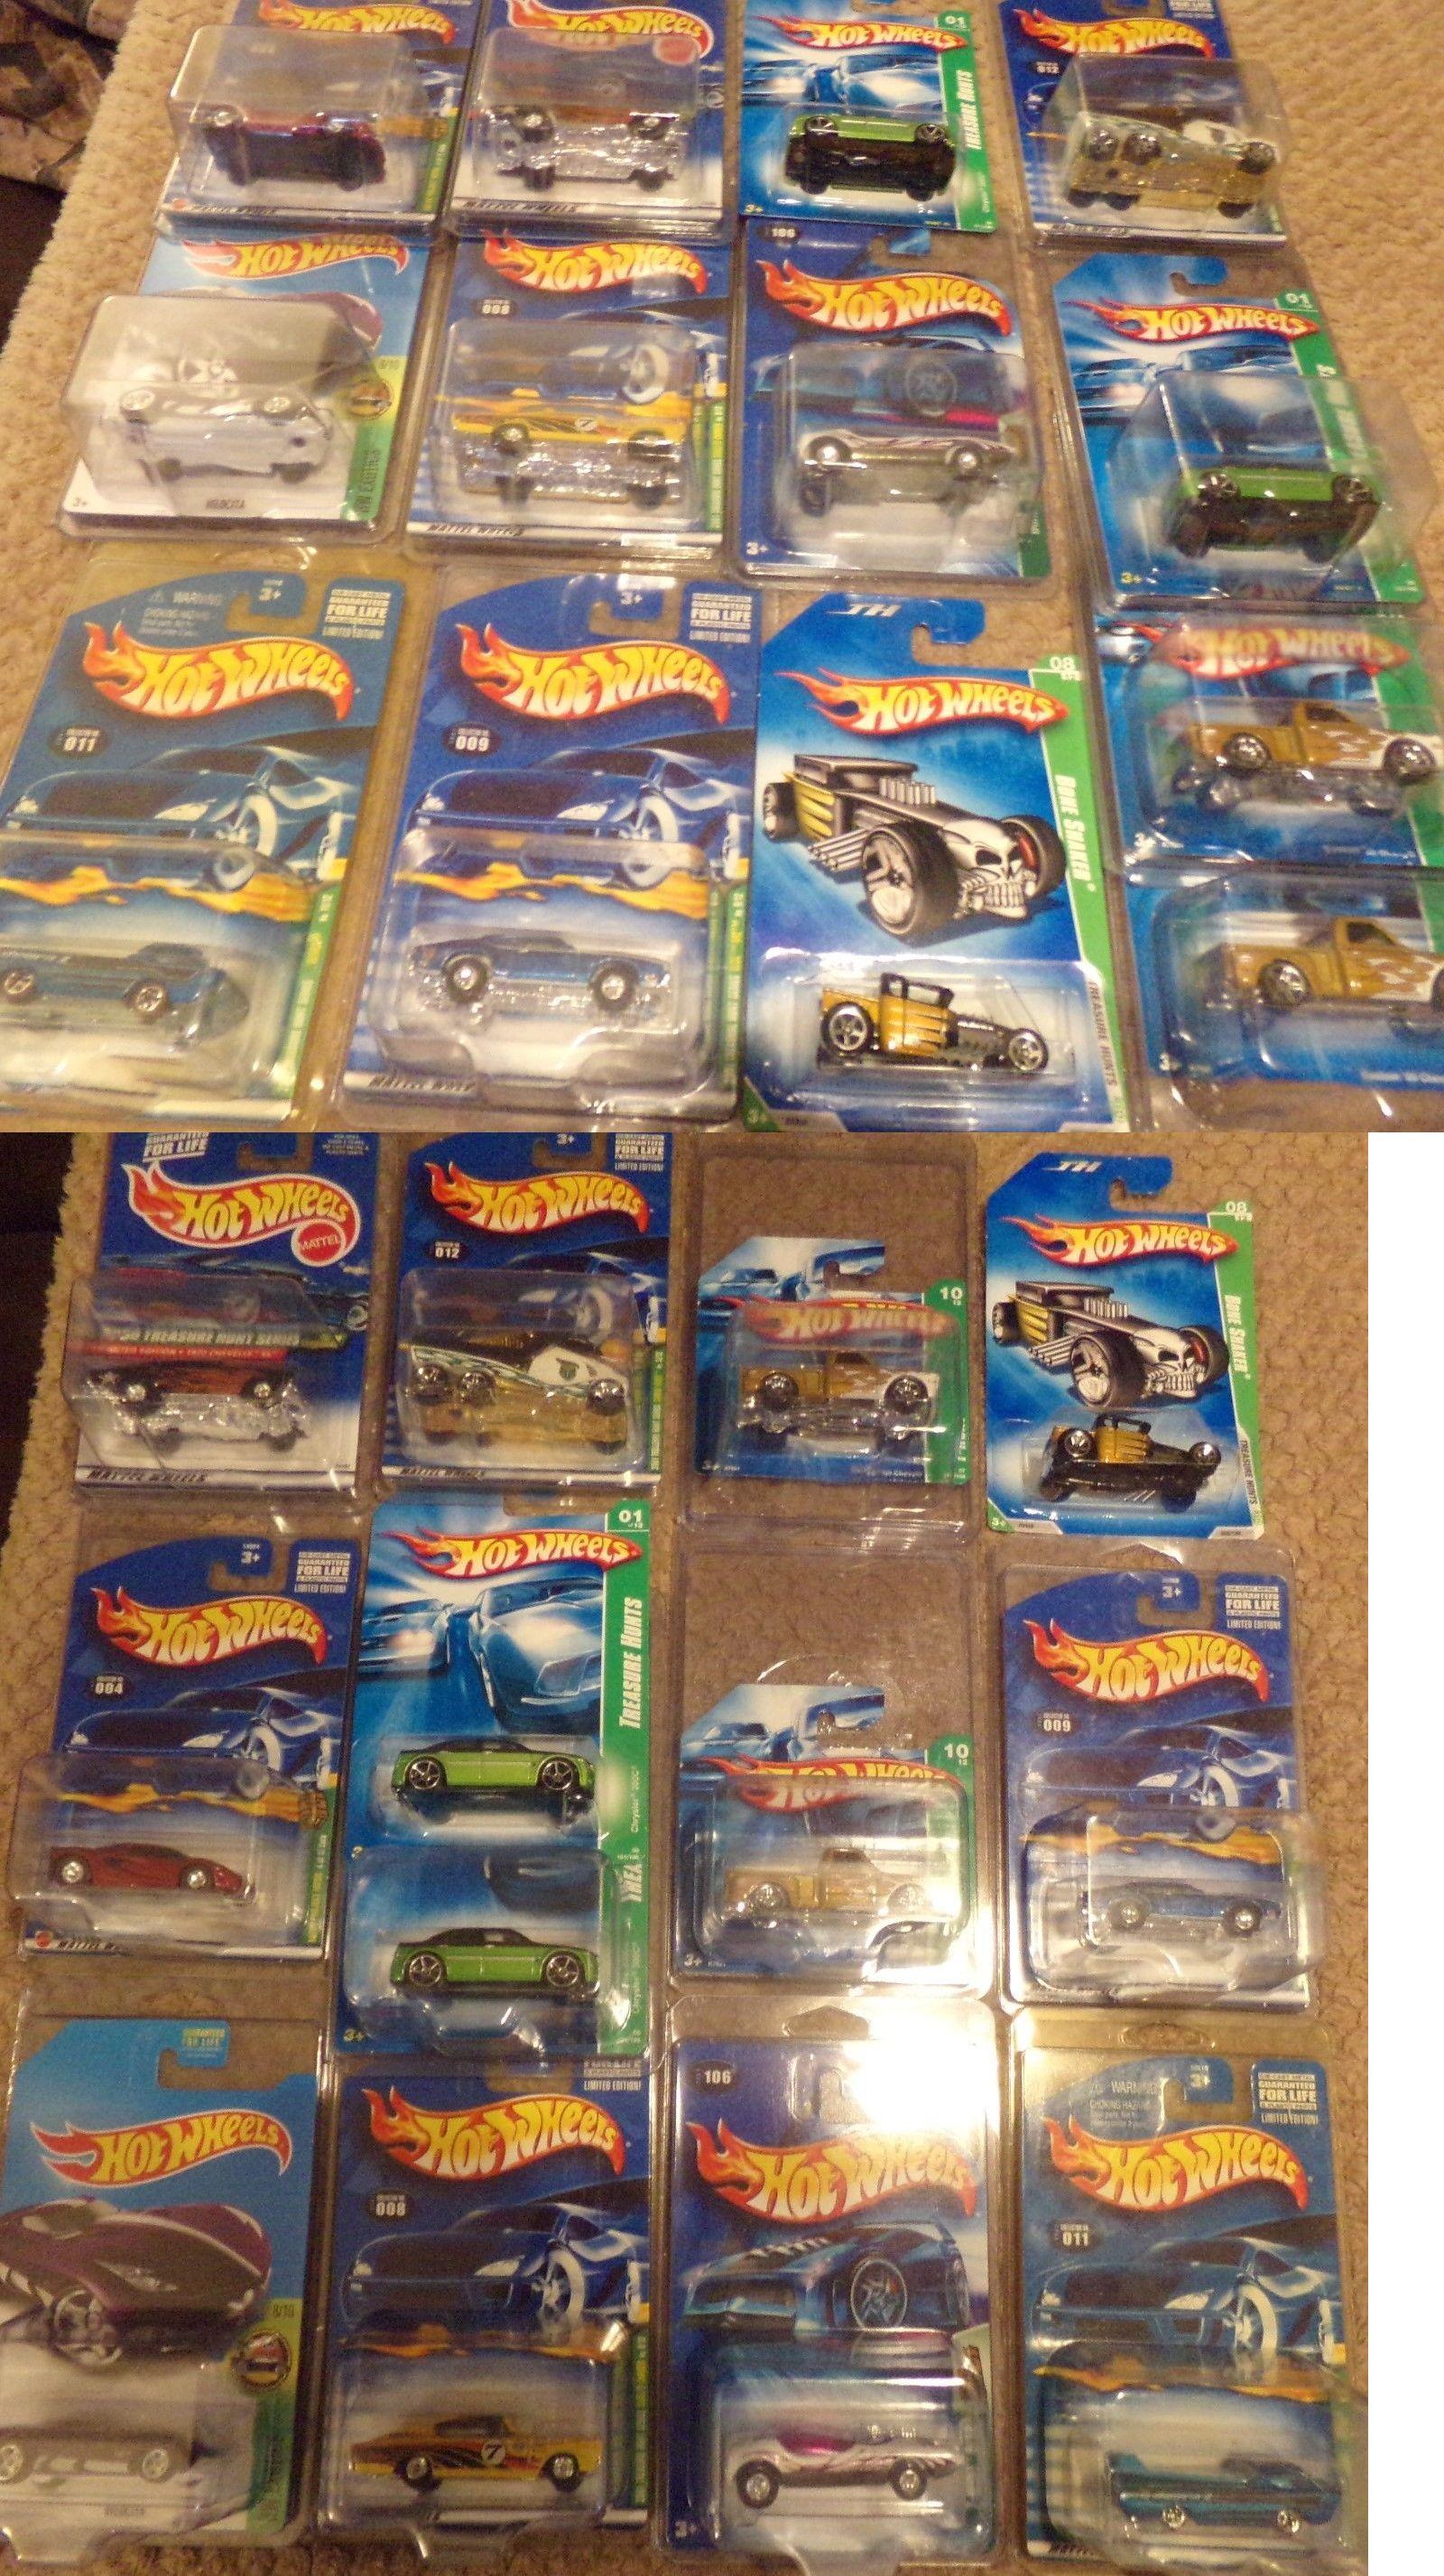 Diecast Toy Vehicles 51023 Lot Of Hot Wheels Treasure Hunts And Htf